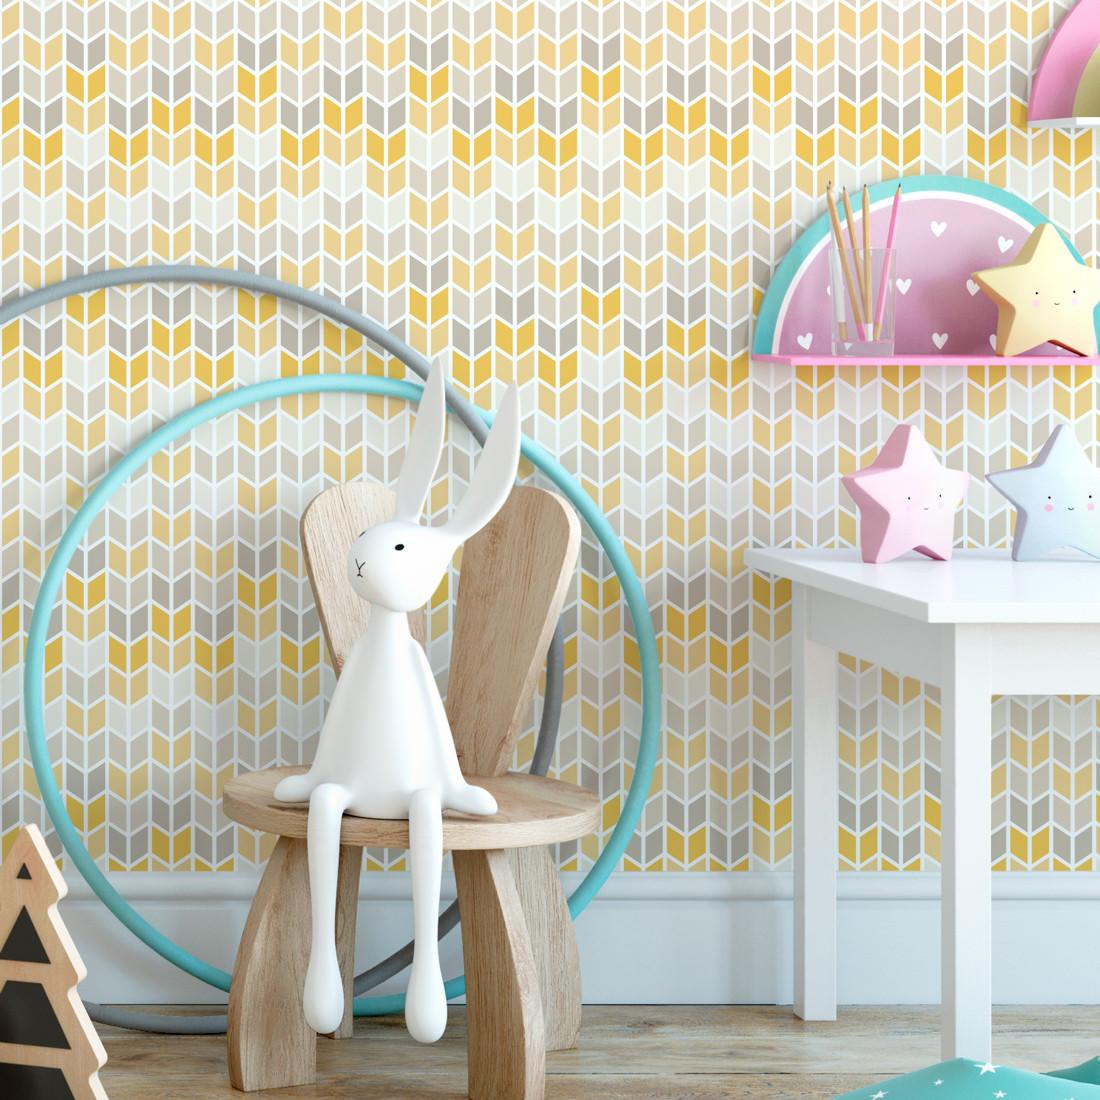 Papel de Parede Infantil setas Amarelo e Cinza